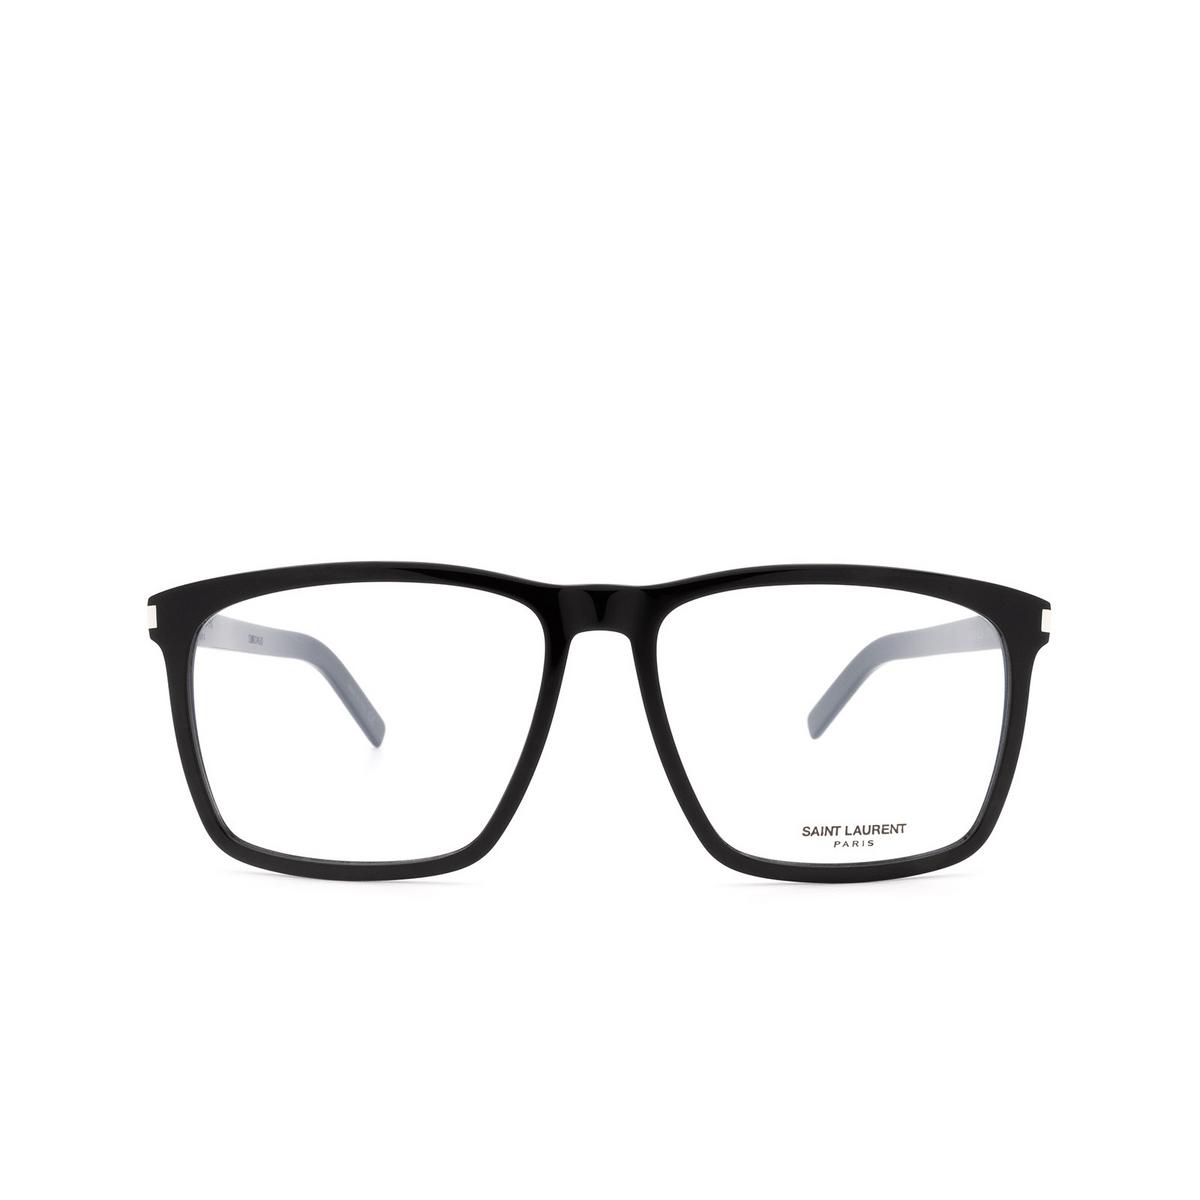 Saint Laurent® Square Eyeglasses: SL 435 SLIM color Black 001.